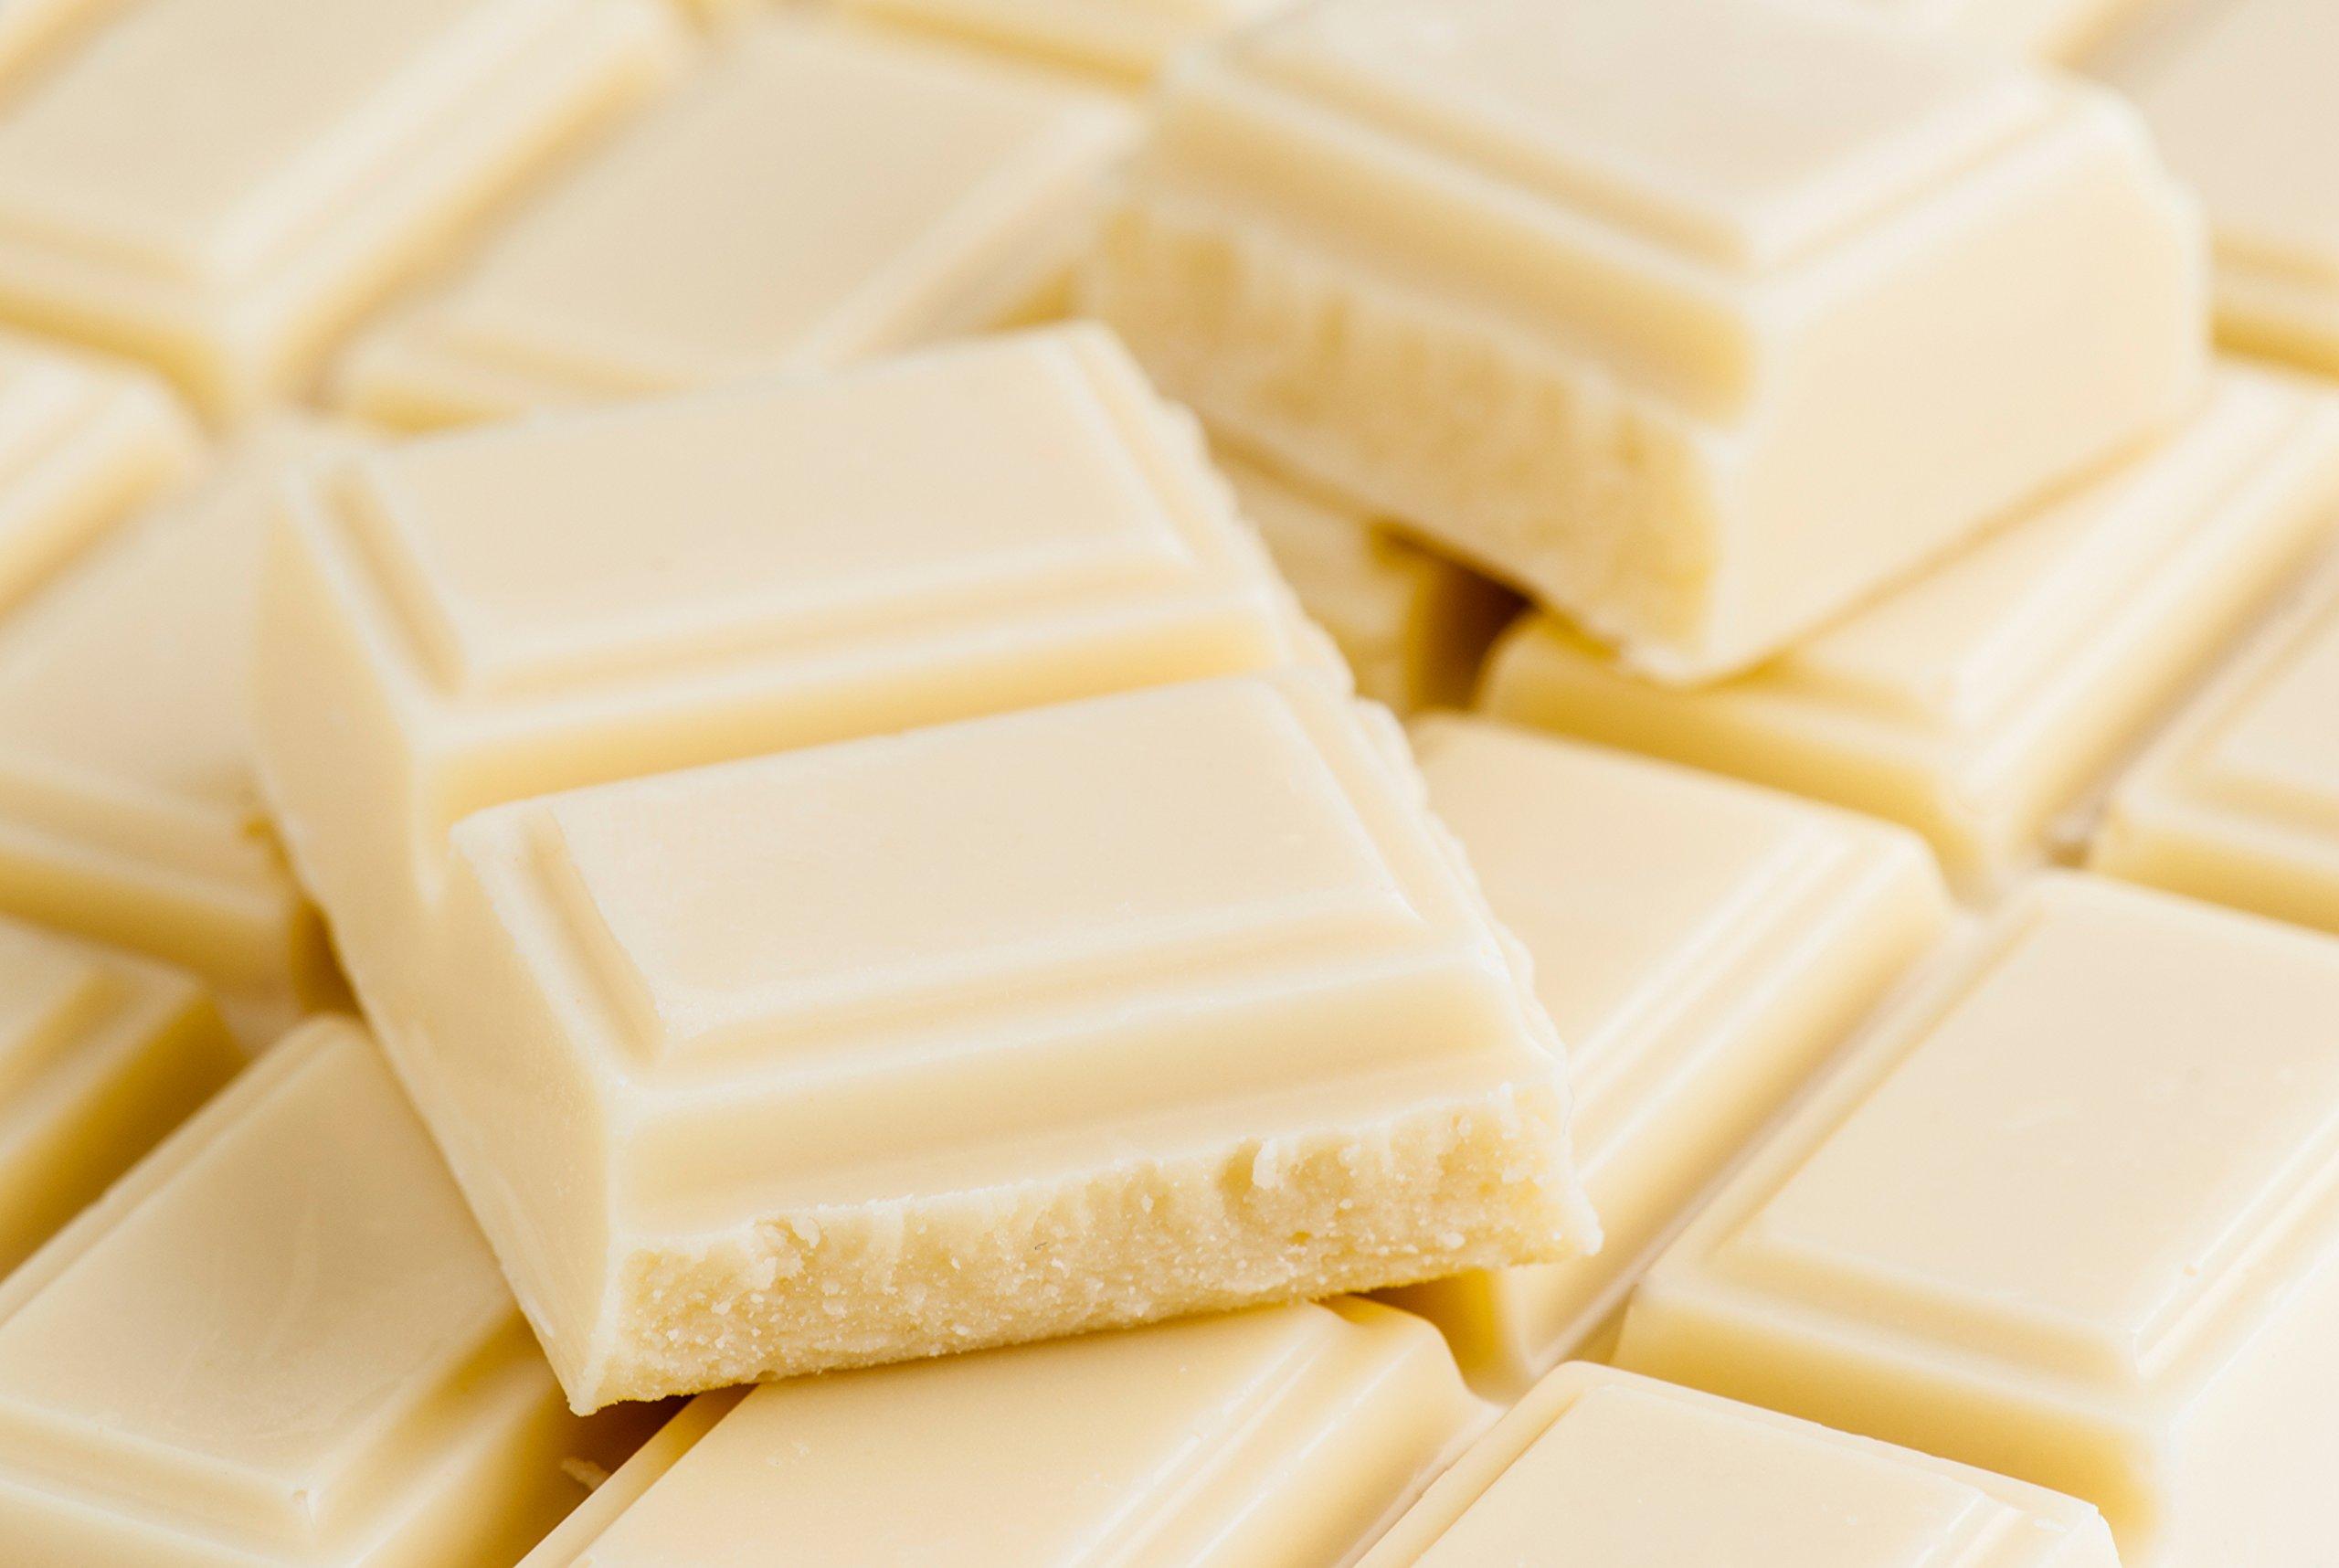 5 Lb Organic Cocoa Butter, Pure, Raw, Unprocessed. Use for Lotion, Cream, Lip Balm, Oil, Stick, or Body Butter. Organically Grown, Non-gmo By Saaqin